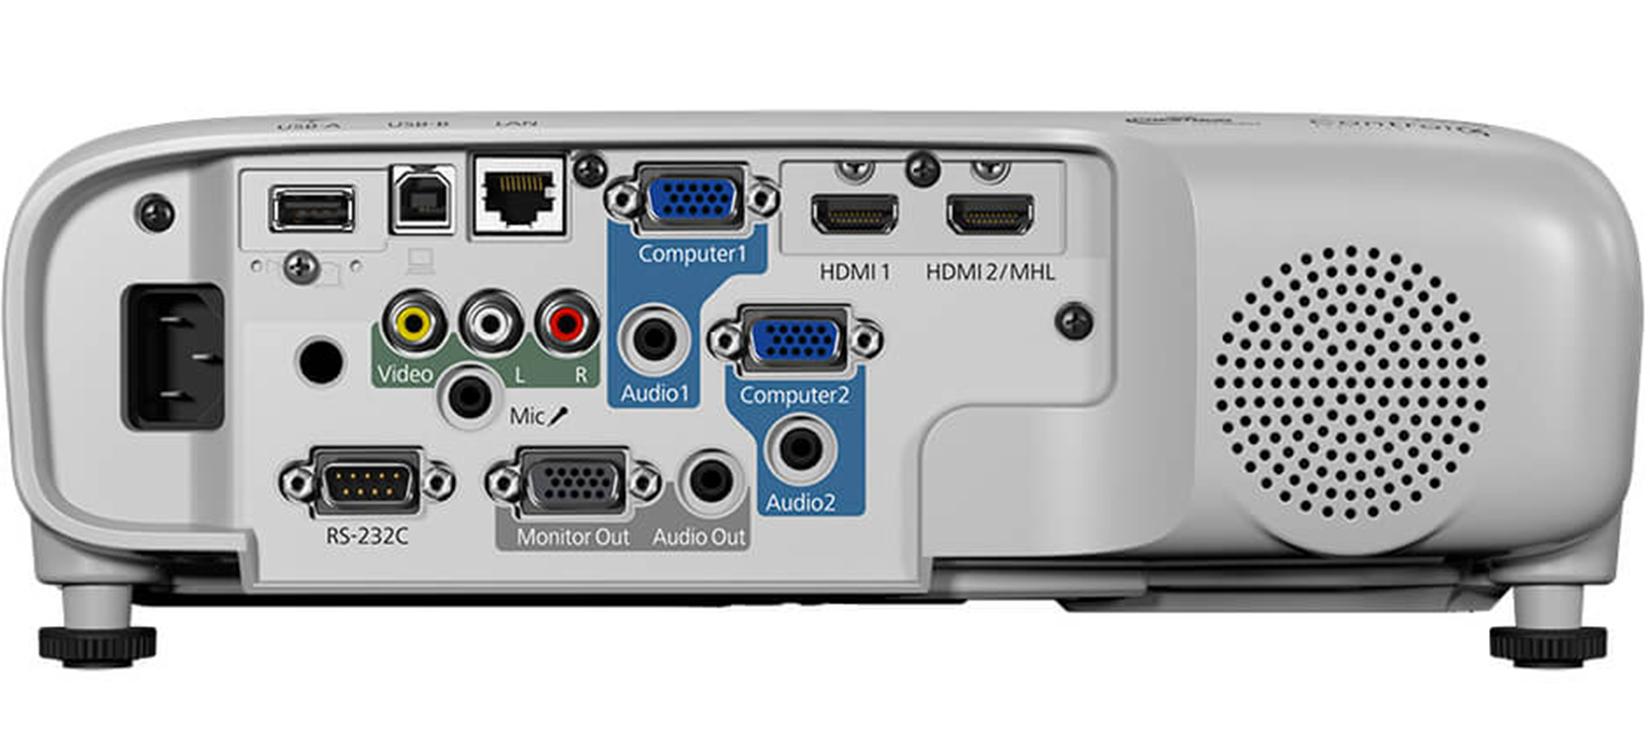 Cổng kết nối Máy Chiếu Epson EB 980W